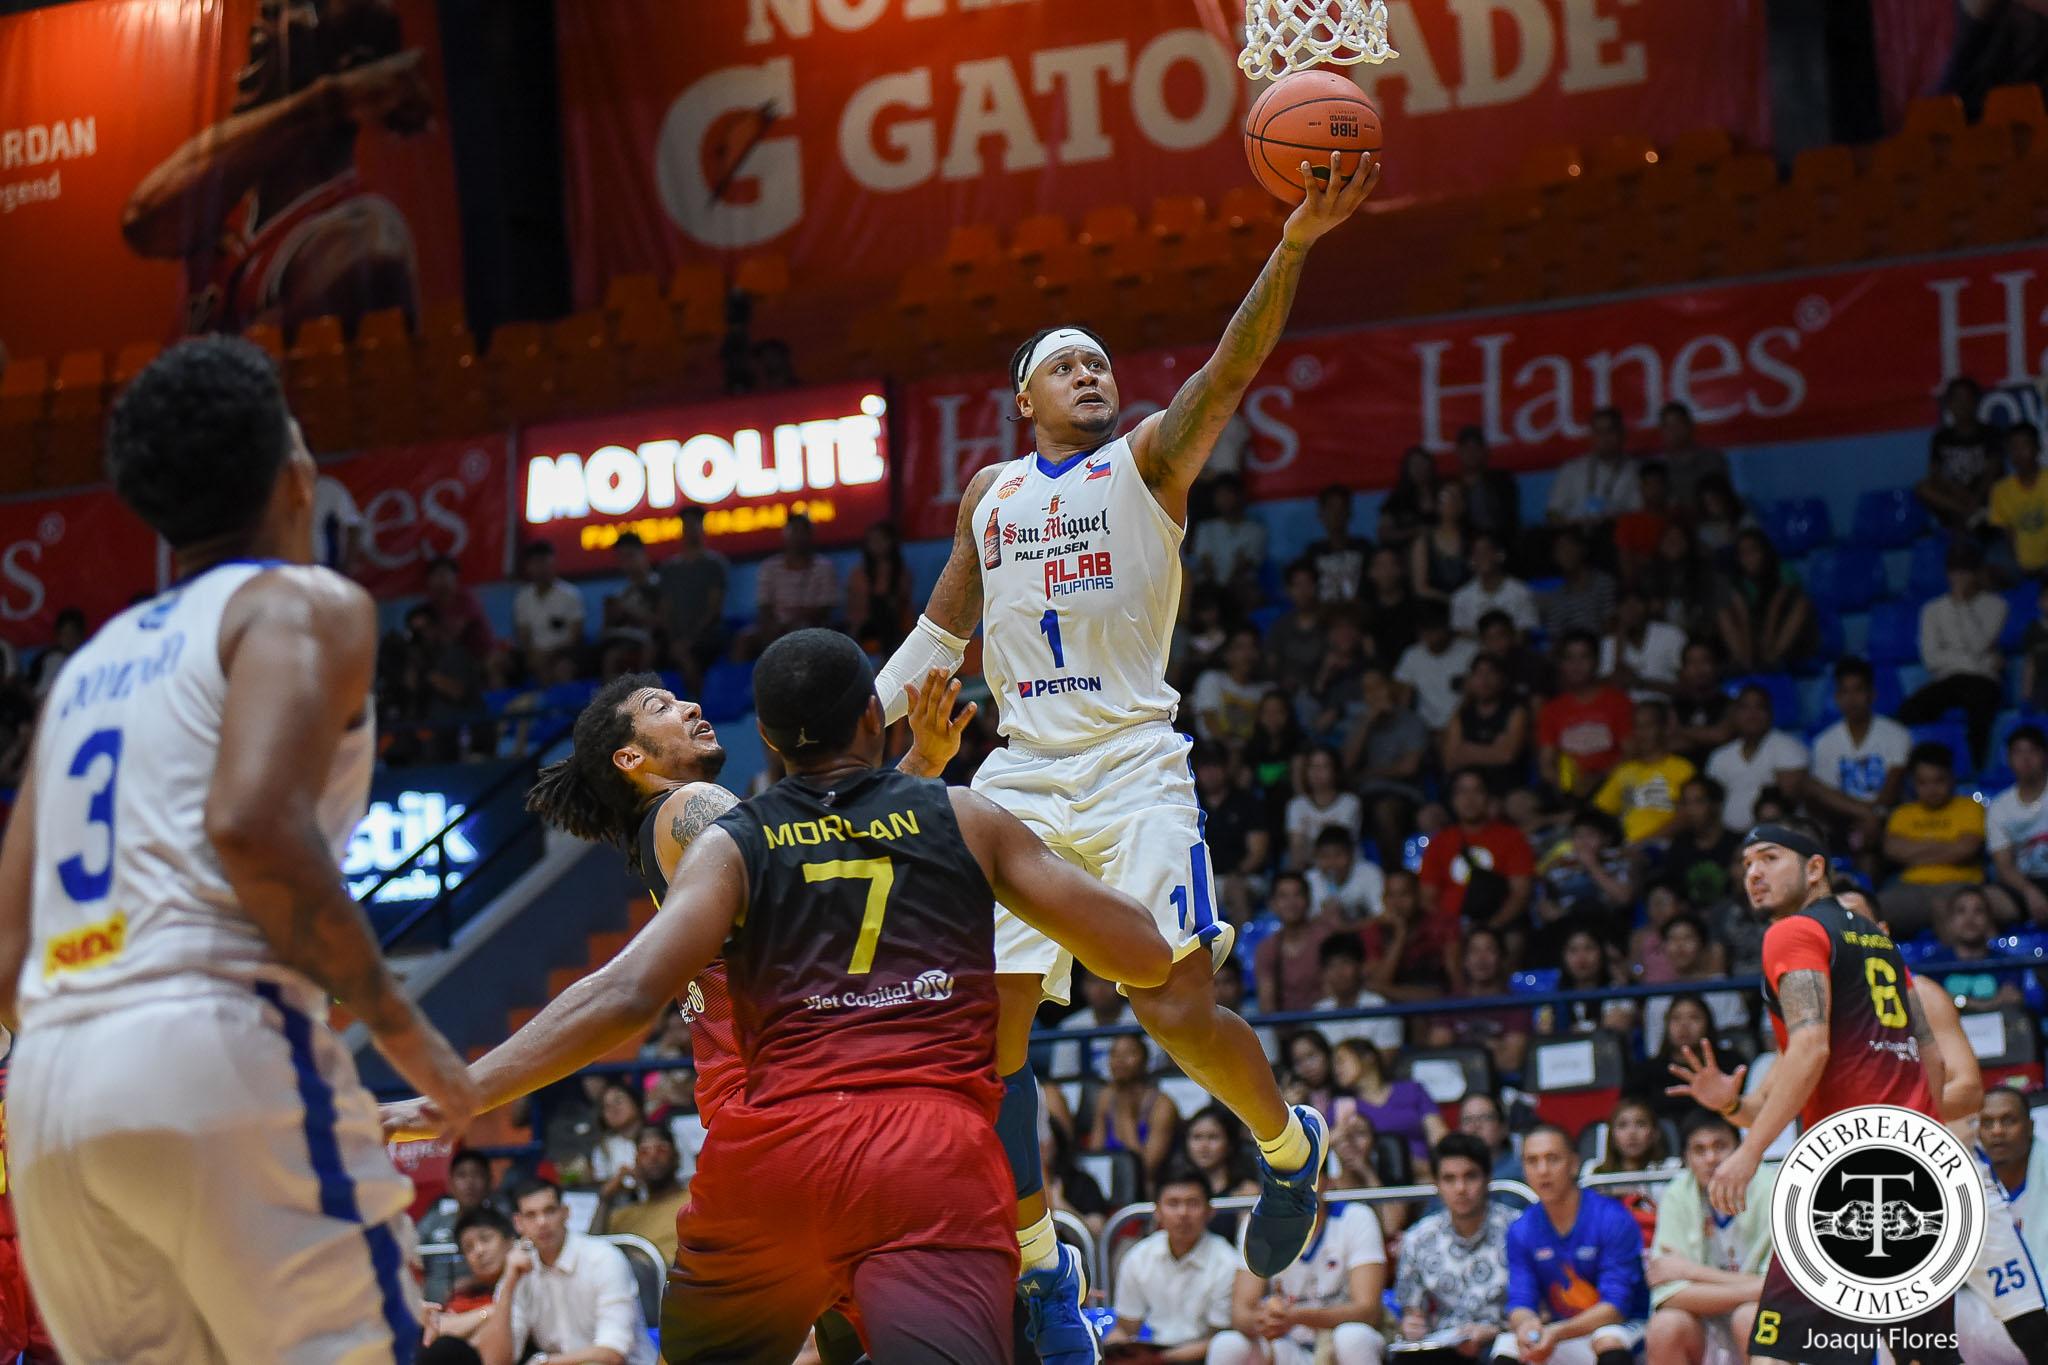 ABL-8-QF-Alab-vs.-Saigon-Parks-0661 Things get physical between Alab and Saigon ABL Alab Pilipinas Basketball News  - philippine sports news